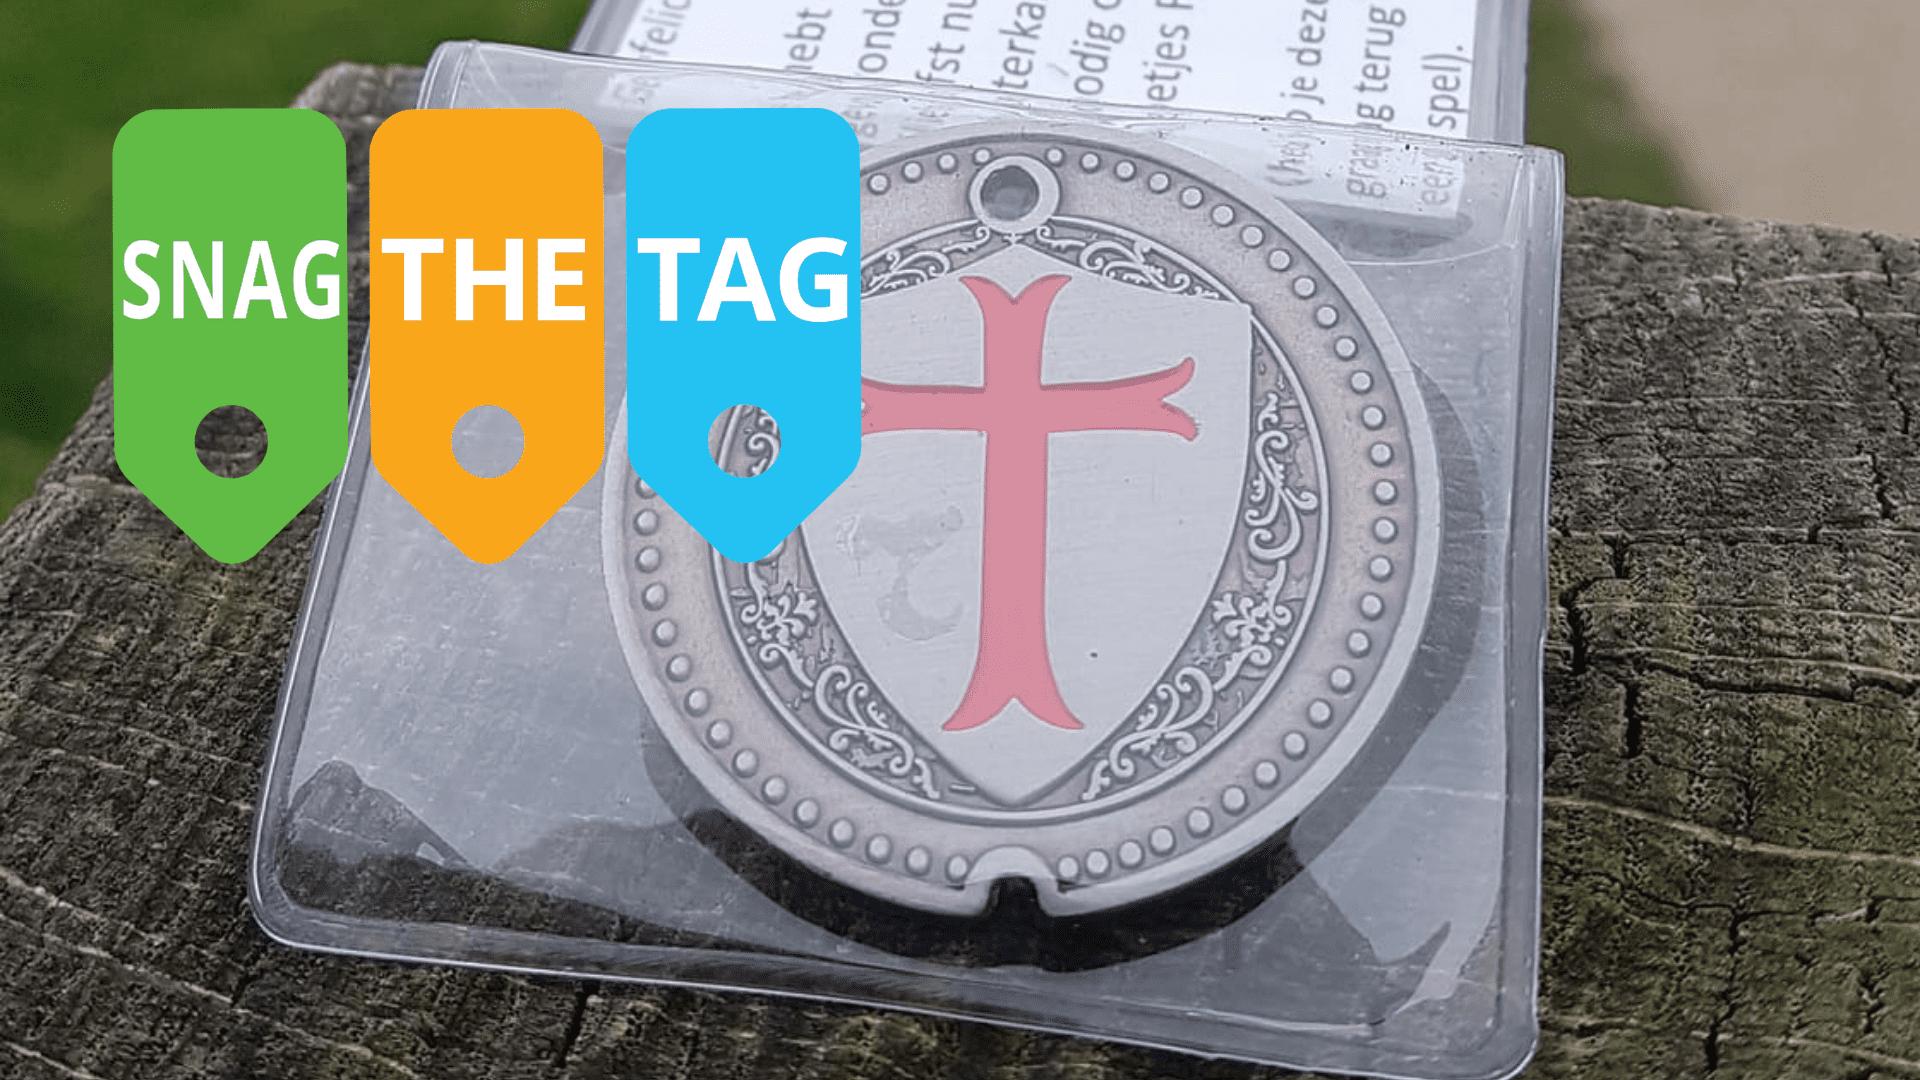 Snag the Tag